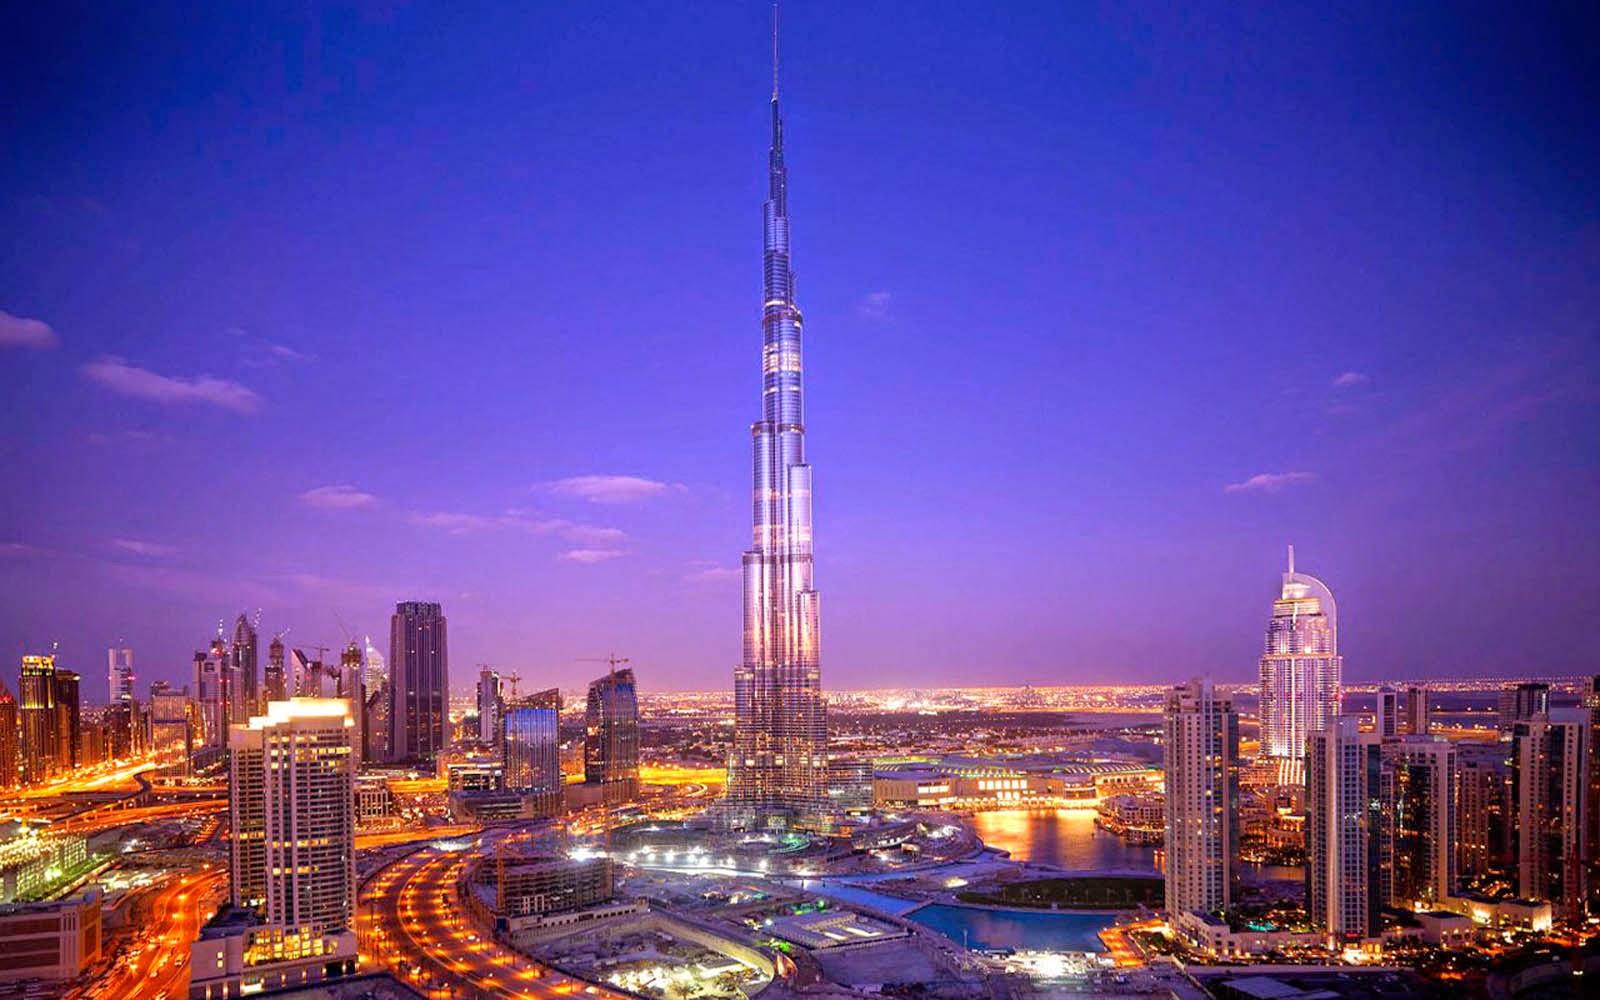 HD Wallpapers: Burj Khalifa Wallpapers At Night